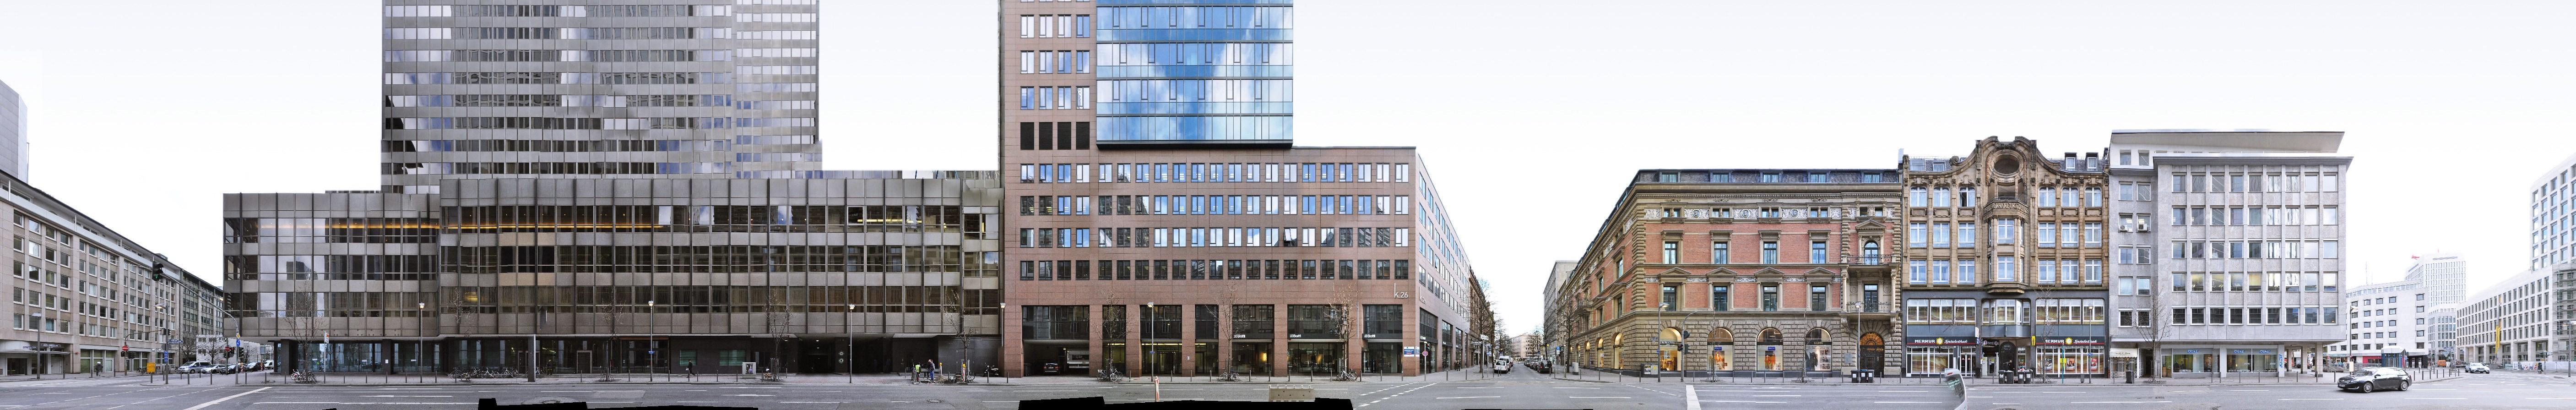 Frankfurt in architektur panoramen panoramastreetline for Architektur frankfurt